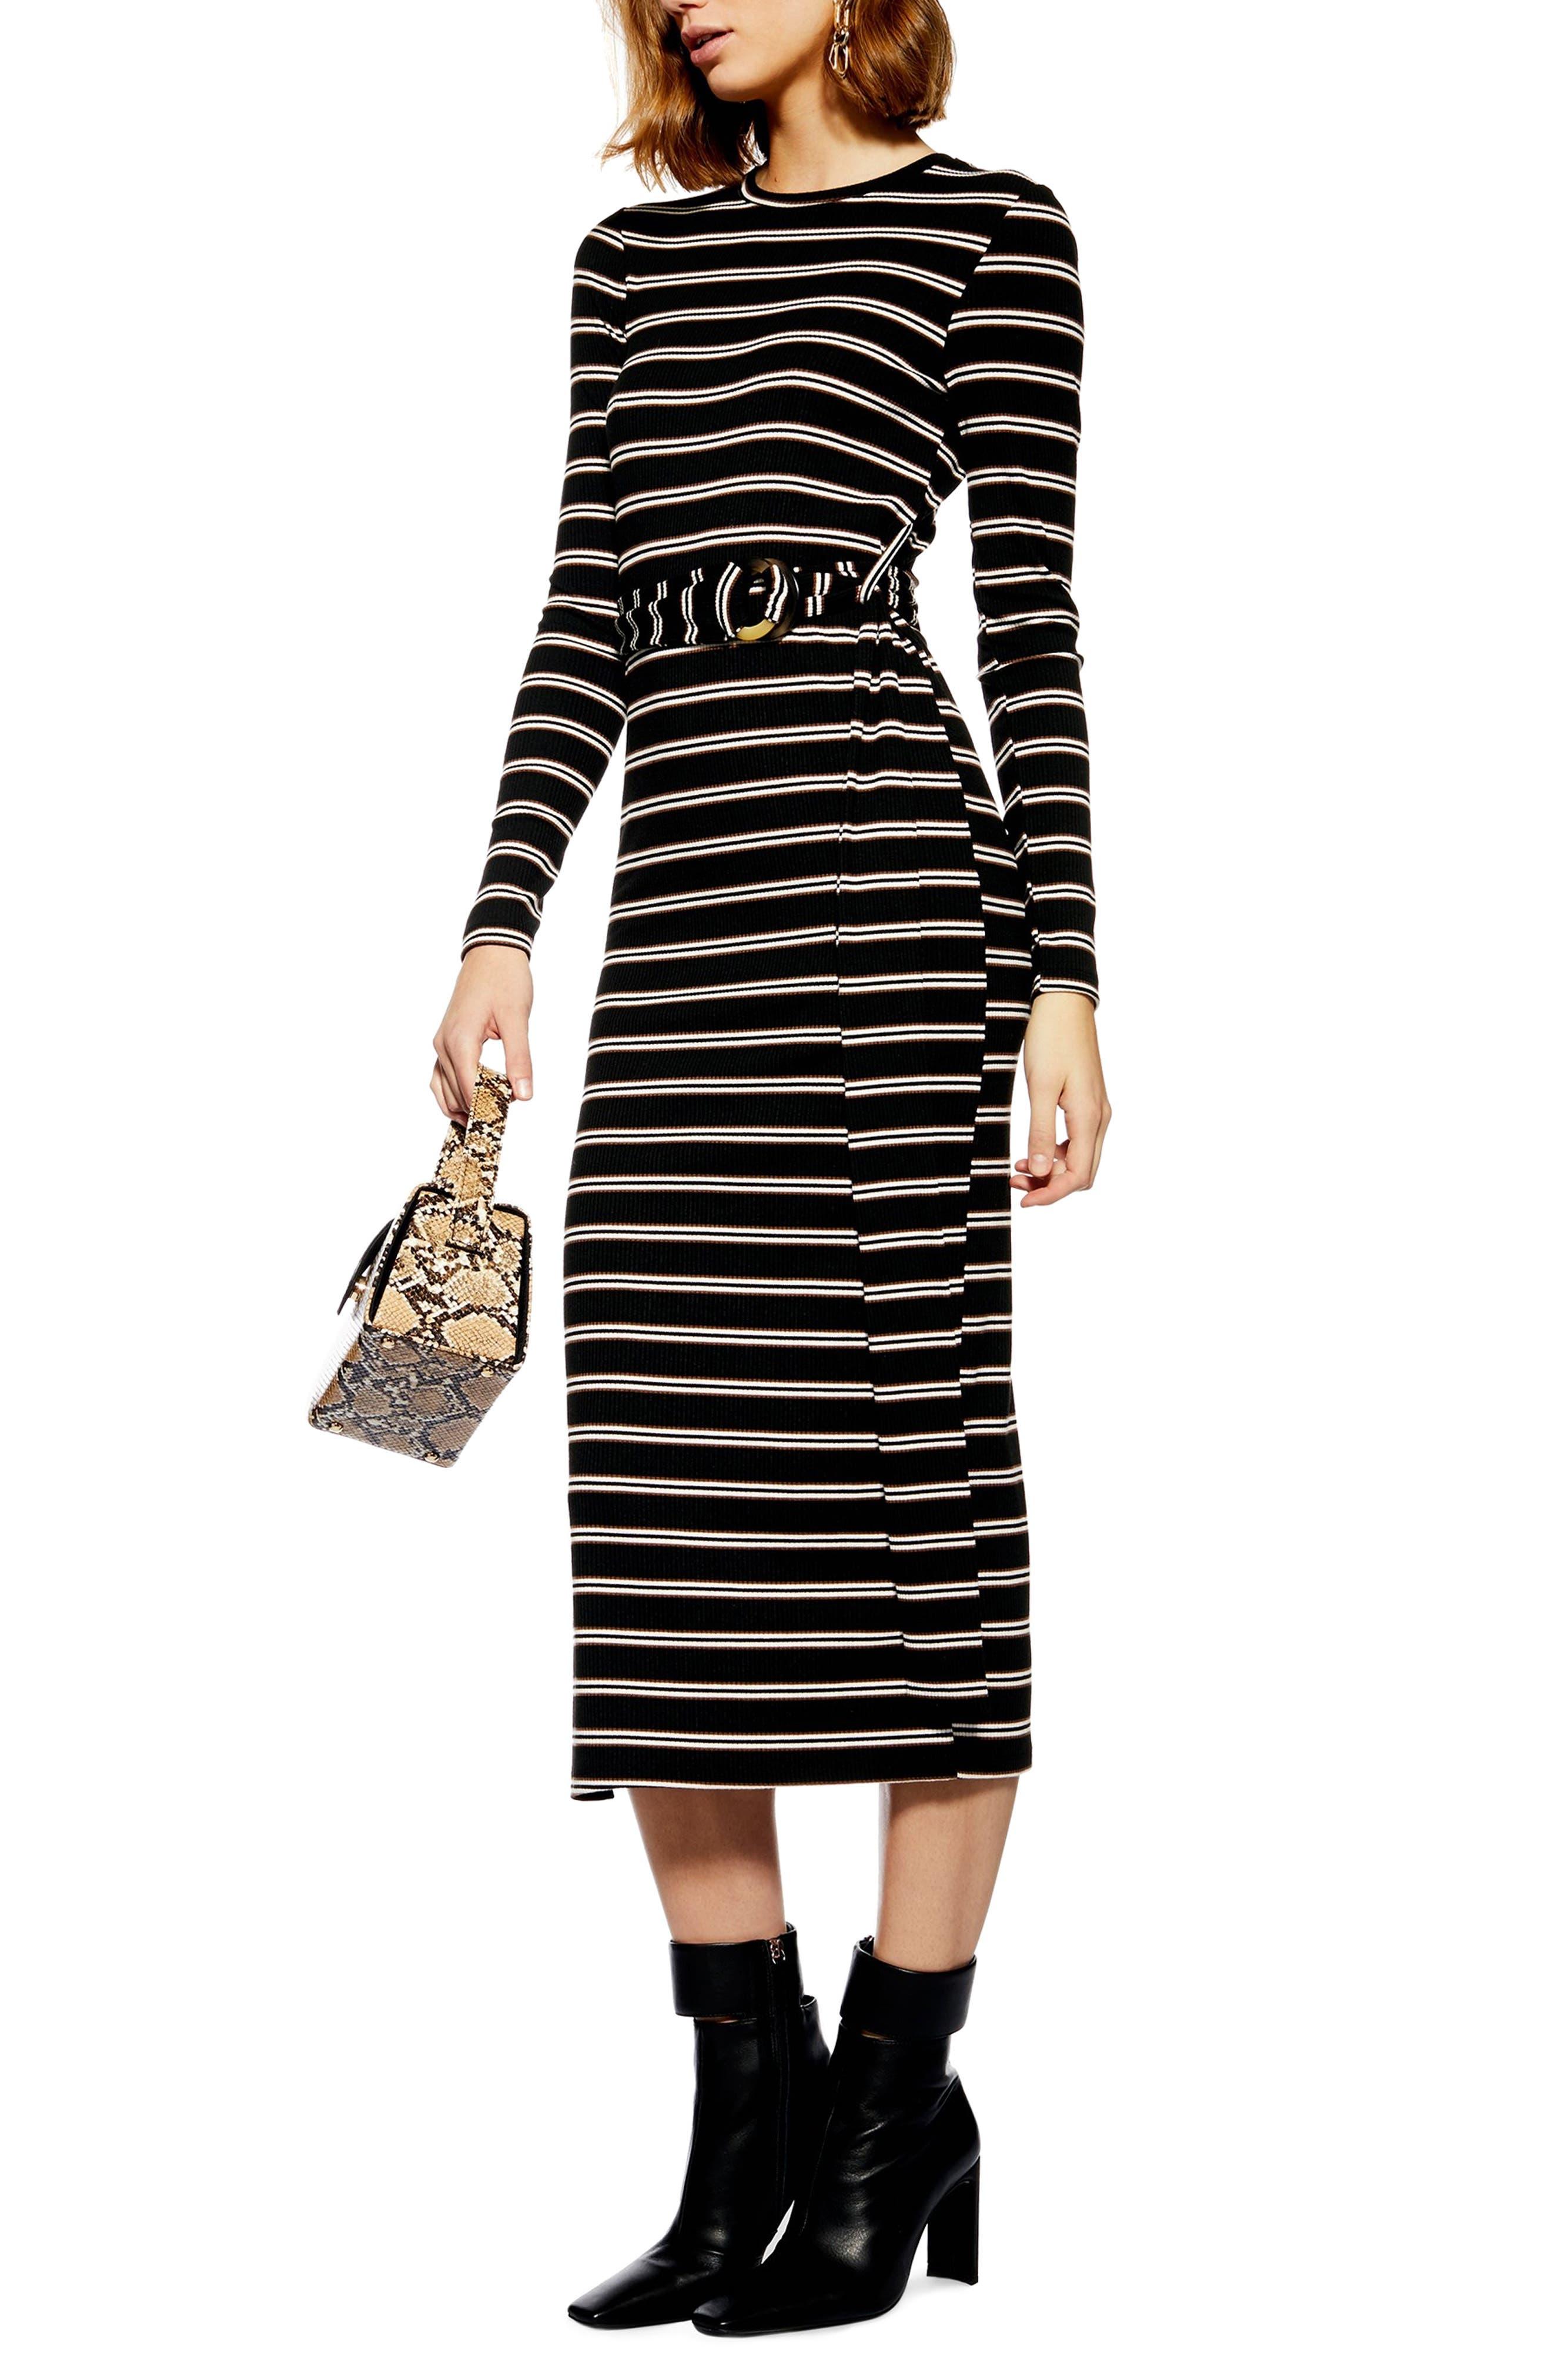 Topshop Striped Belted Midi Dress